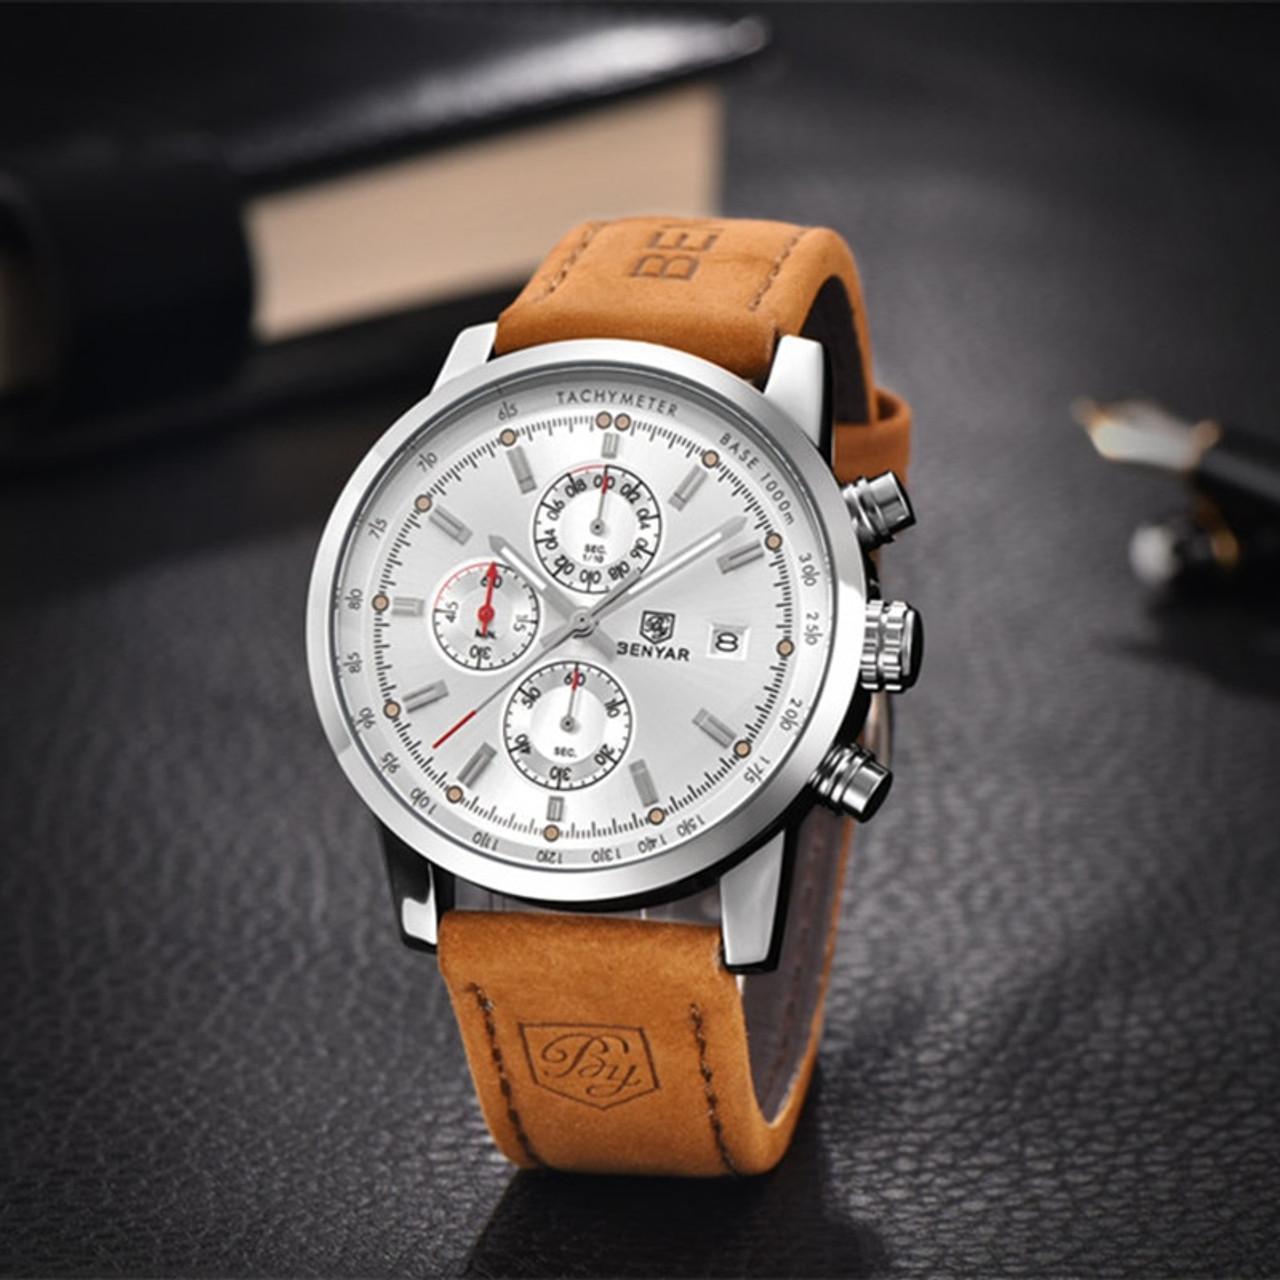 9b1feddb1b9 ... 2017 BENYAR Watches Men Luxury Brand Quartz Watch Fashion Chronograph  Sport Reloj Hombre Clock Male hour ...